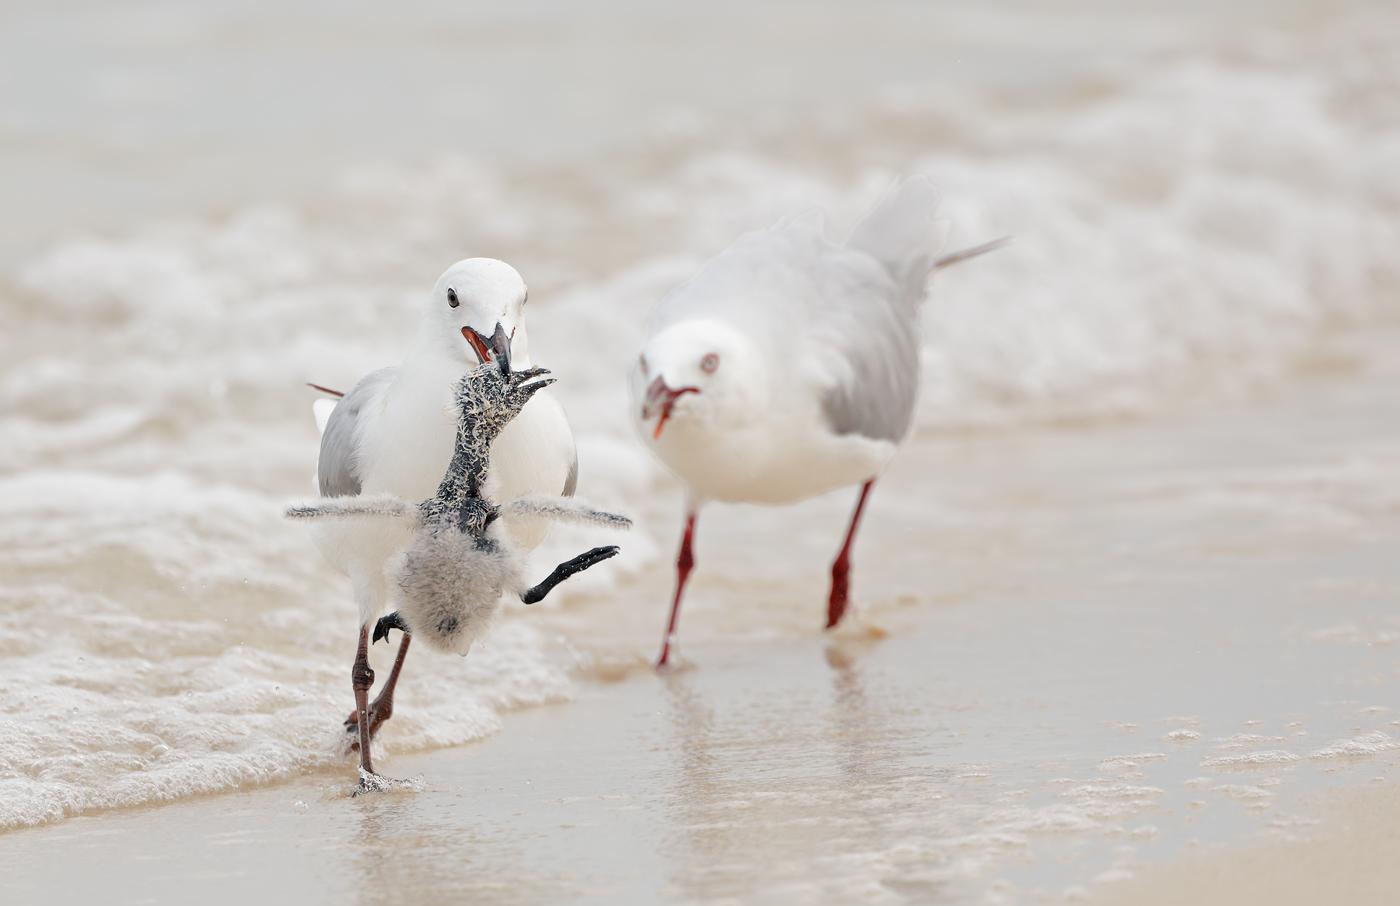 Common Noddy, Silver Gull